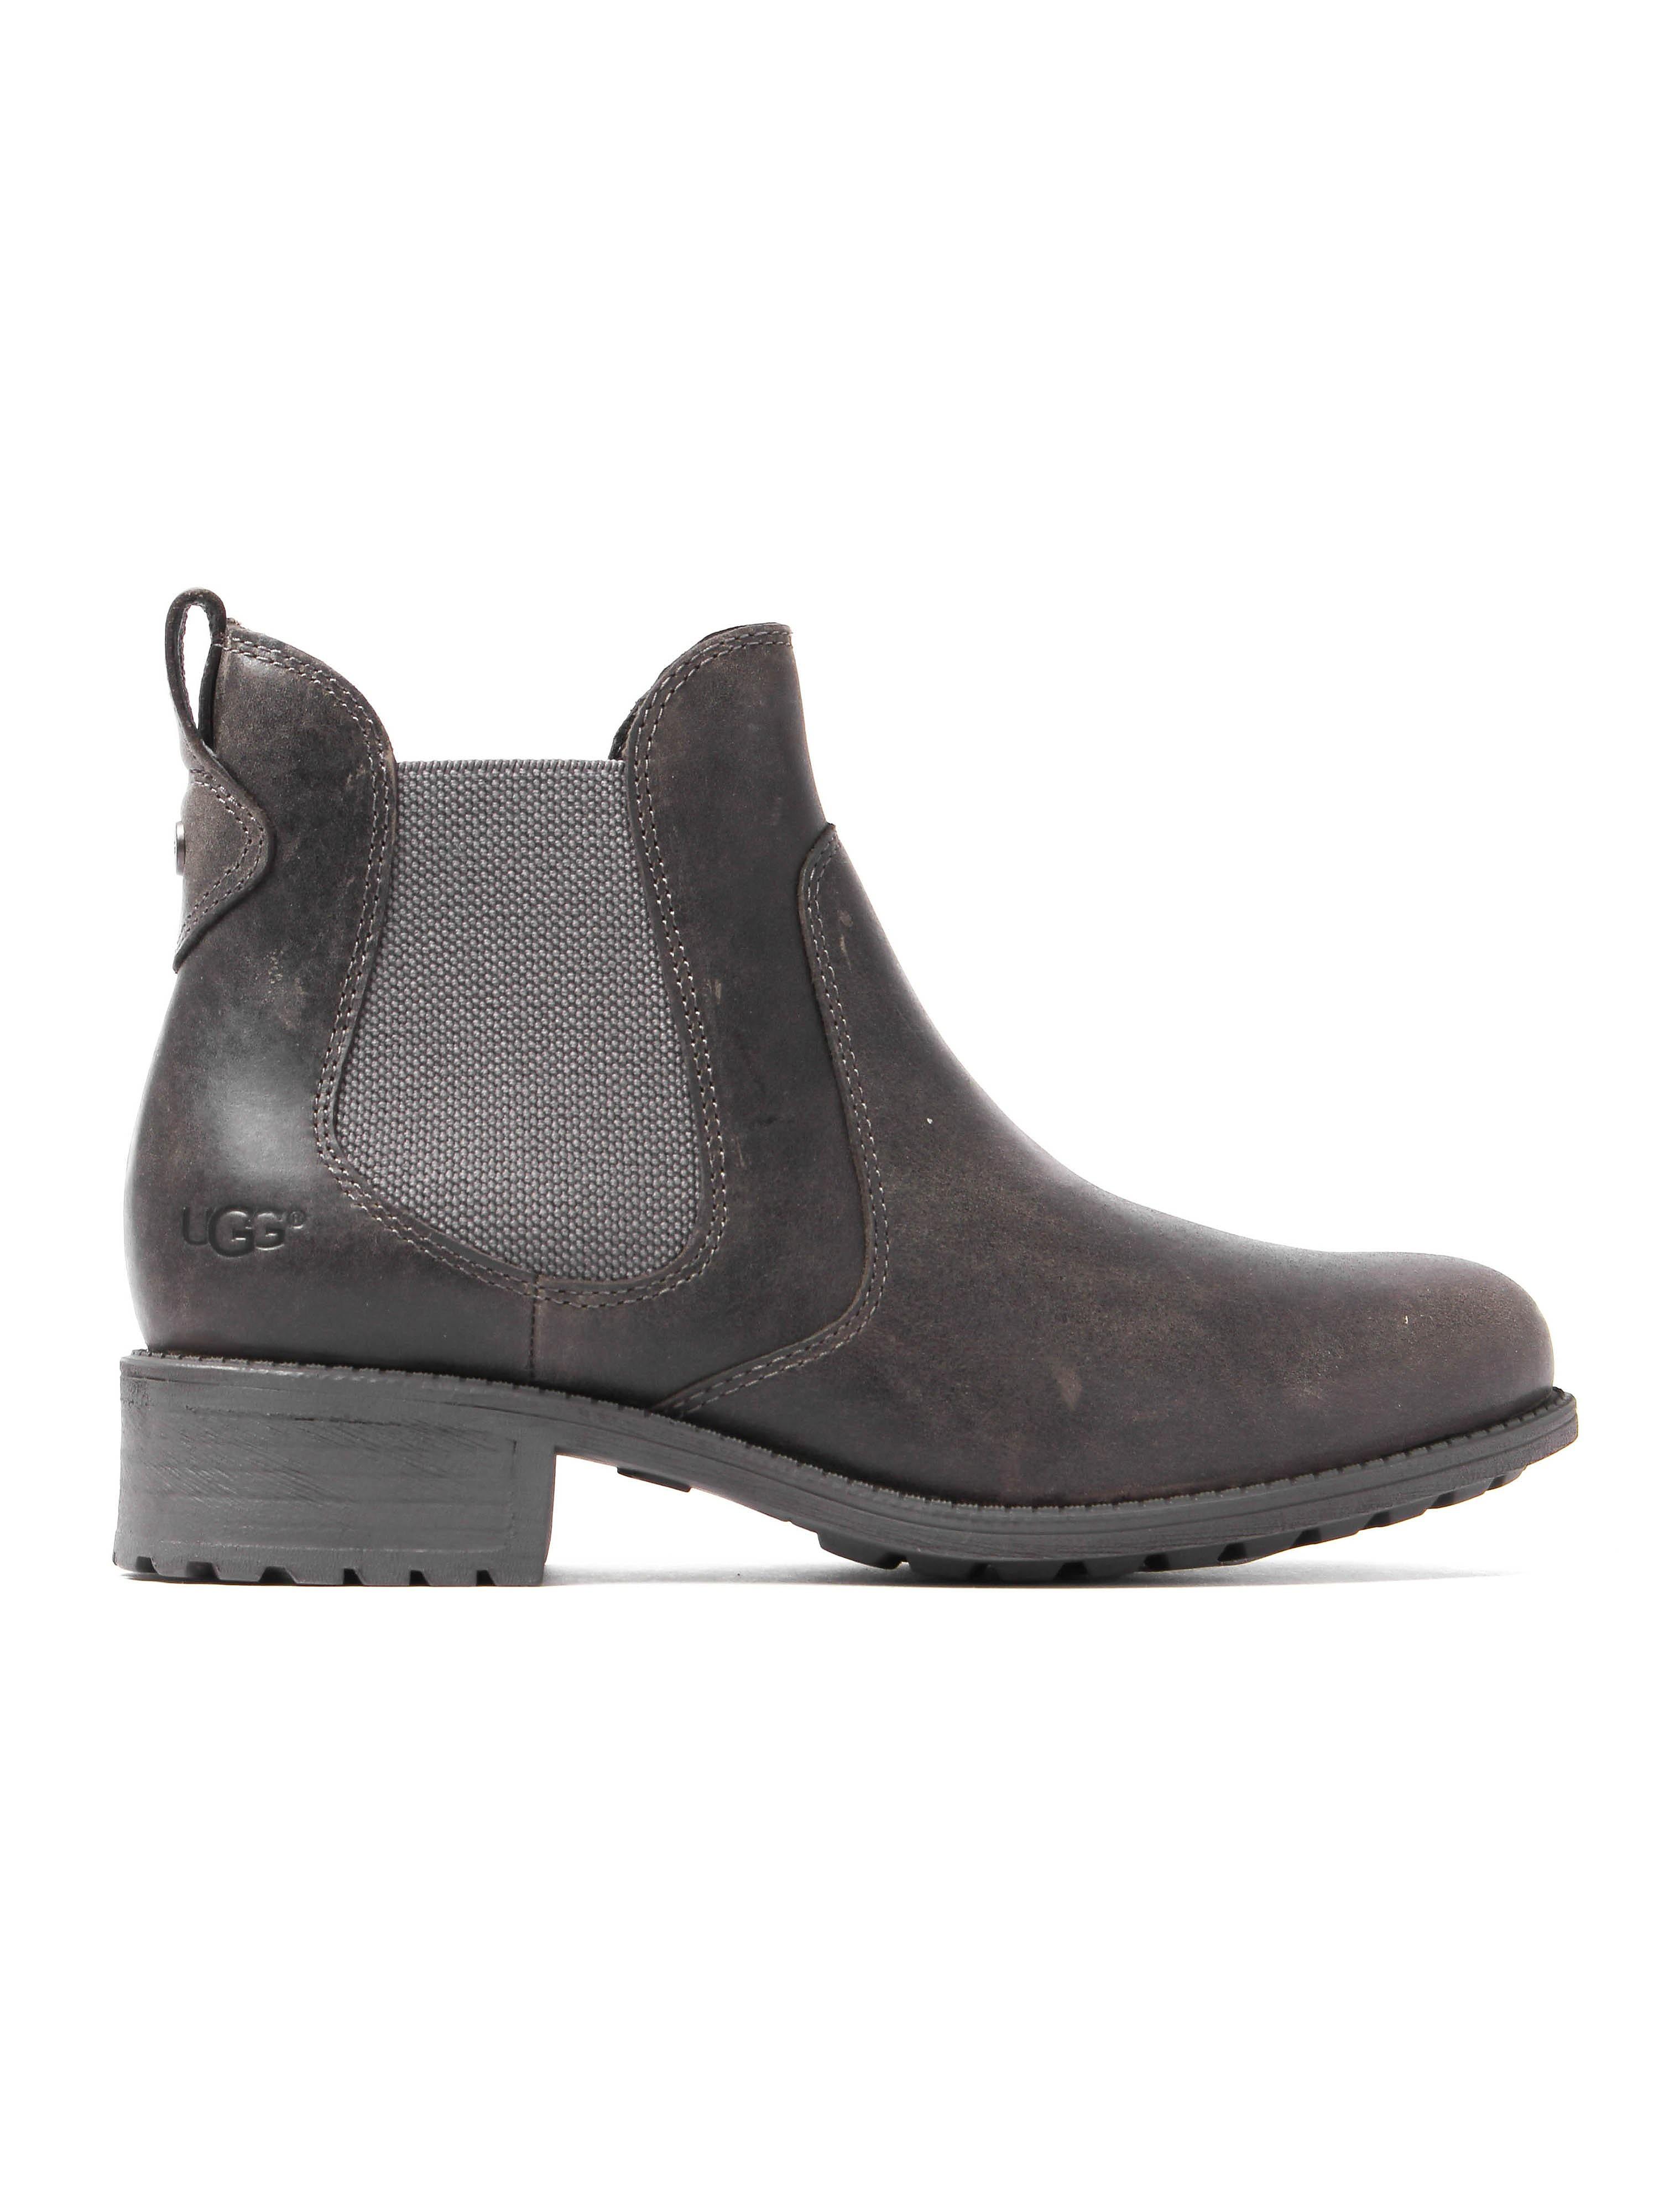 UGG Women's Bonham Boots - Grey